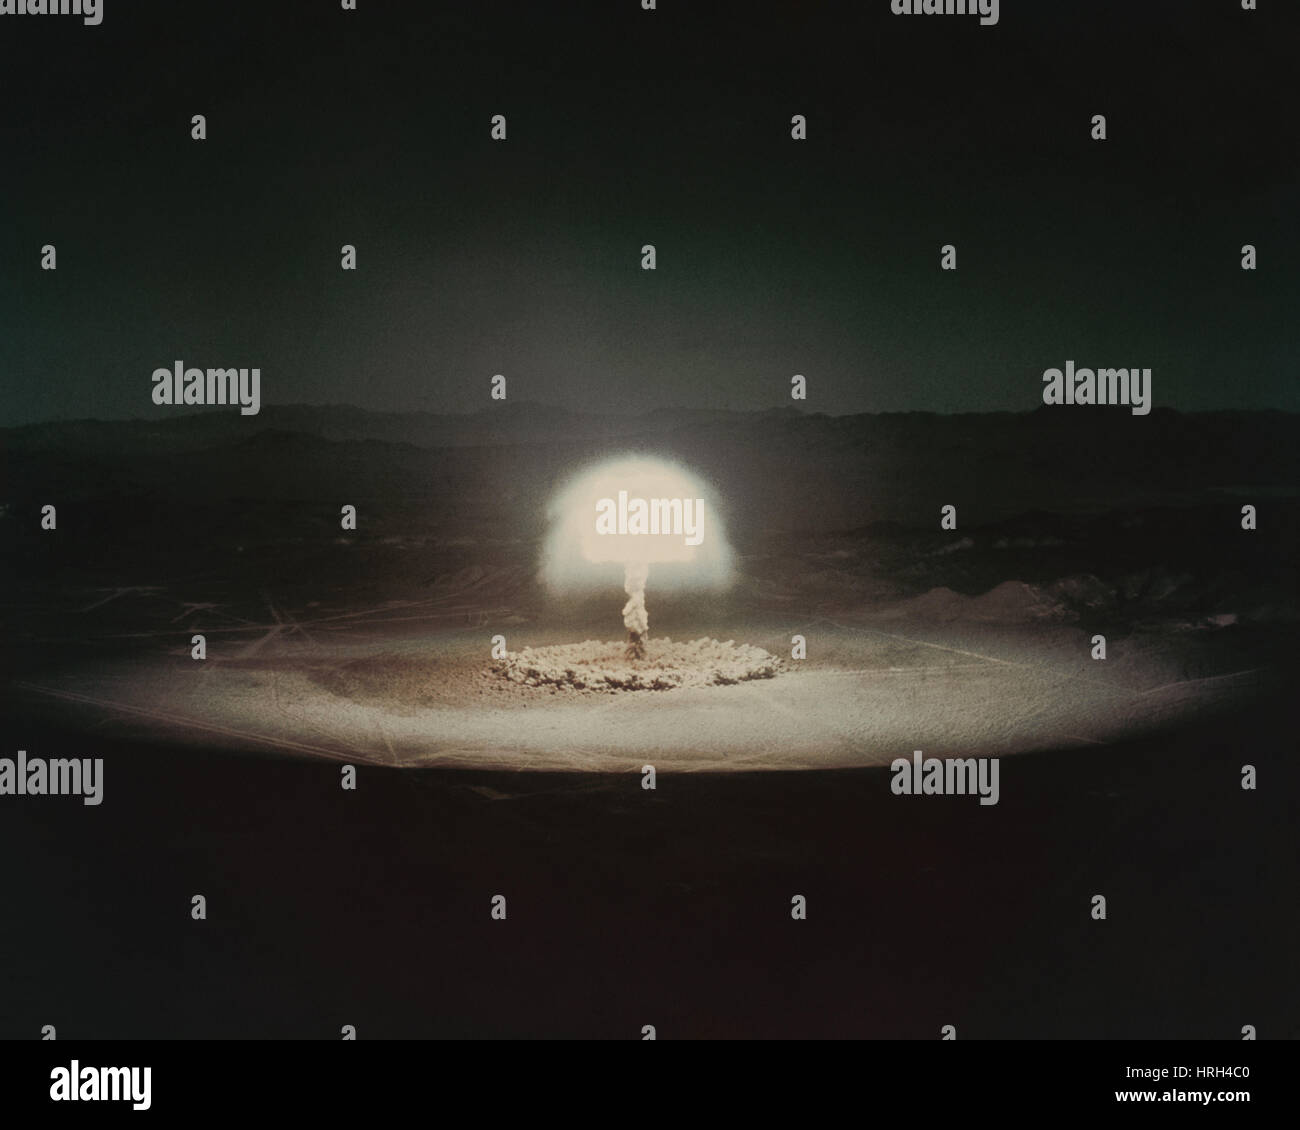 atomic-bomb-test-HRH4C0.jpg